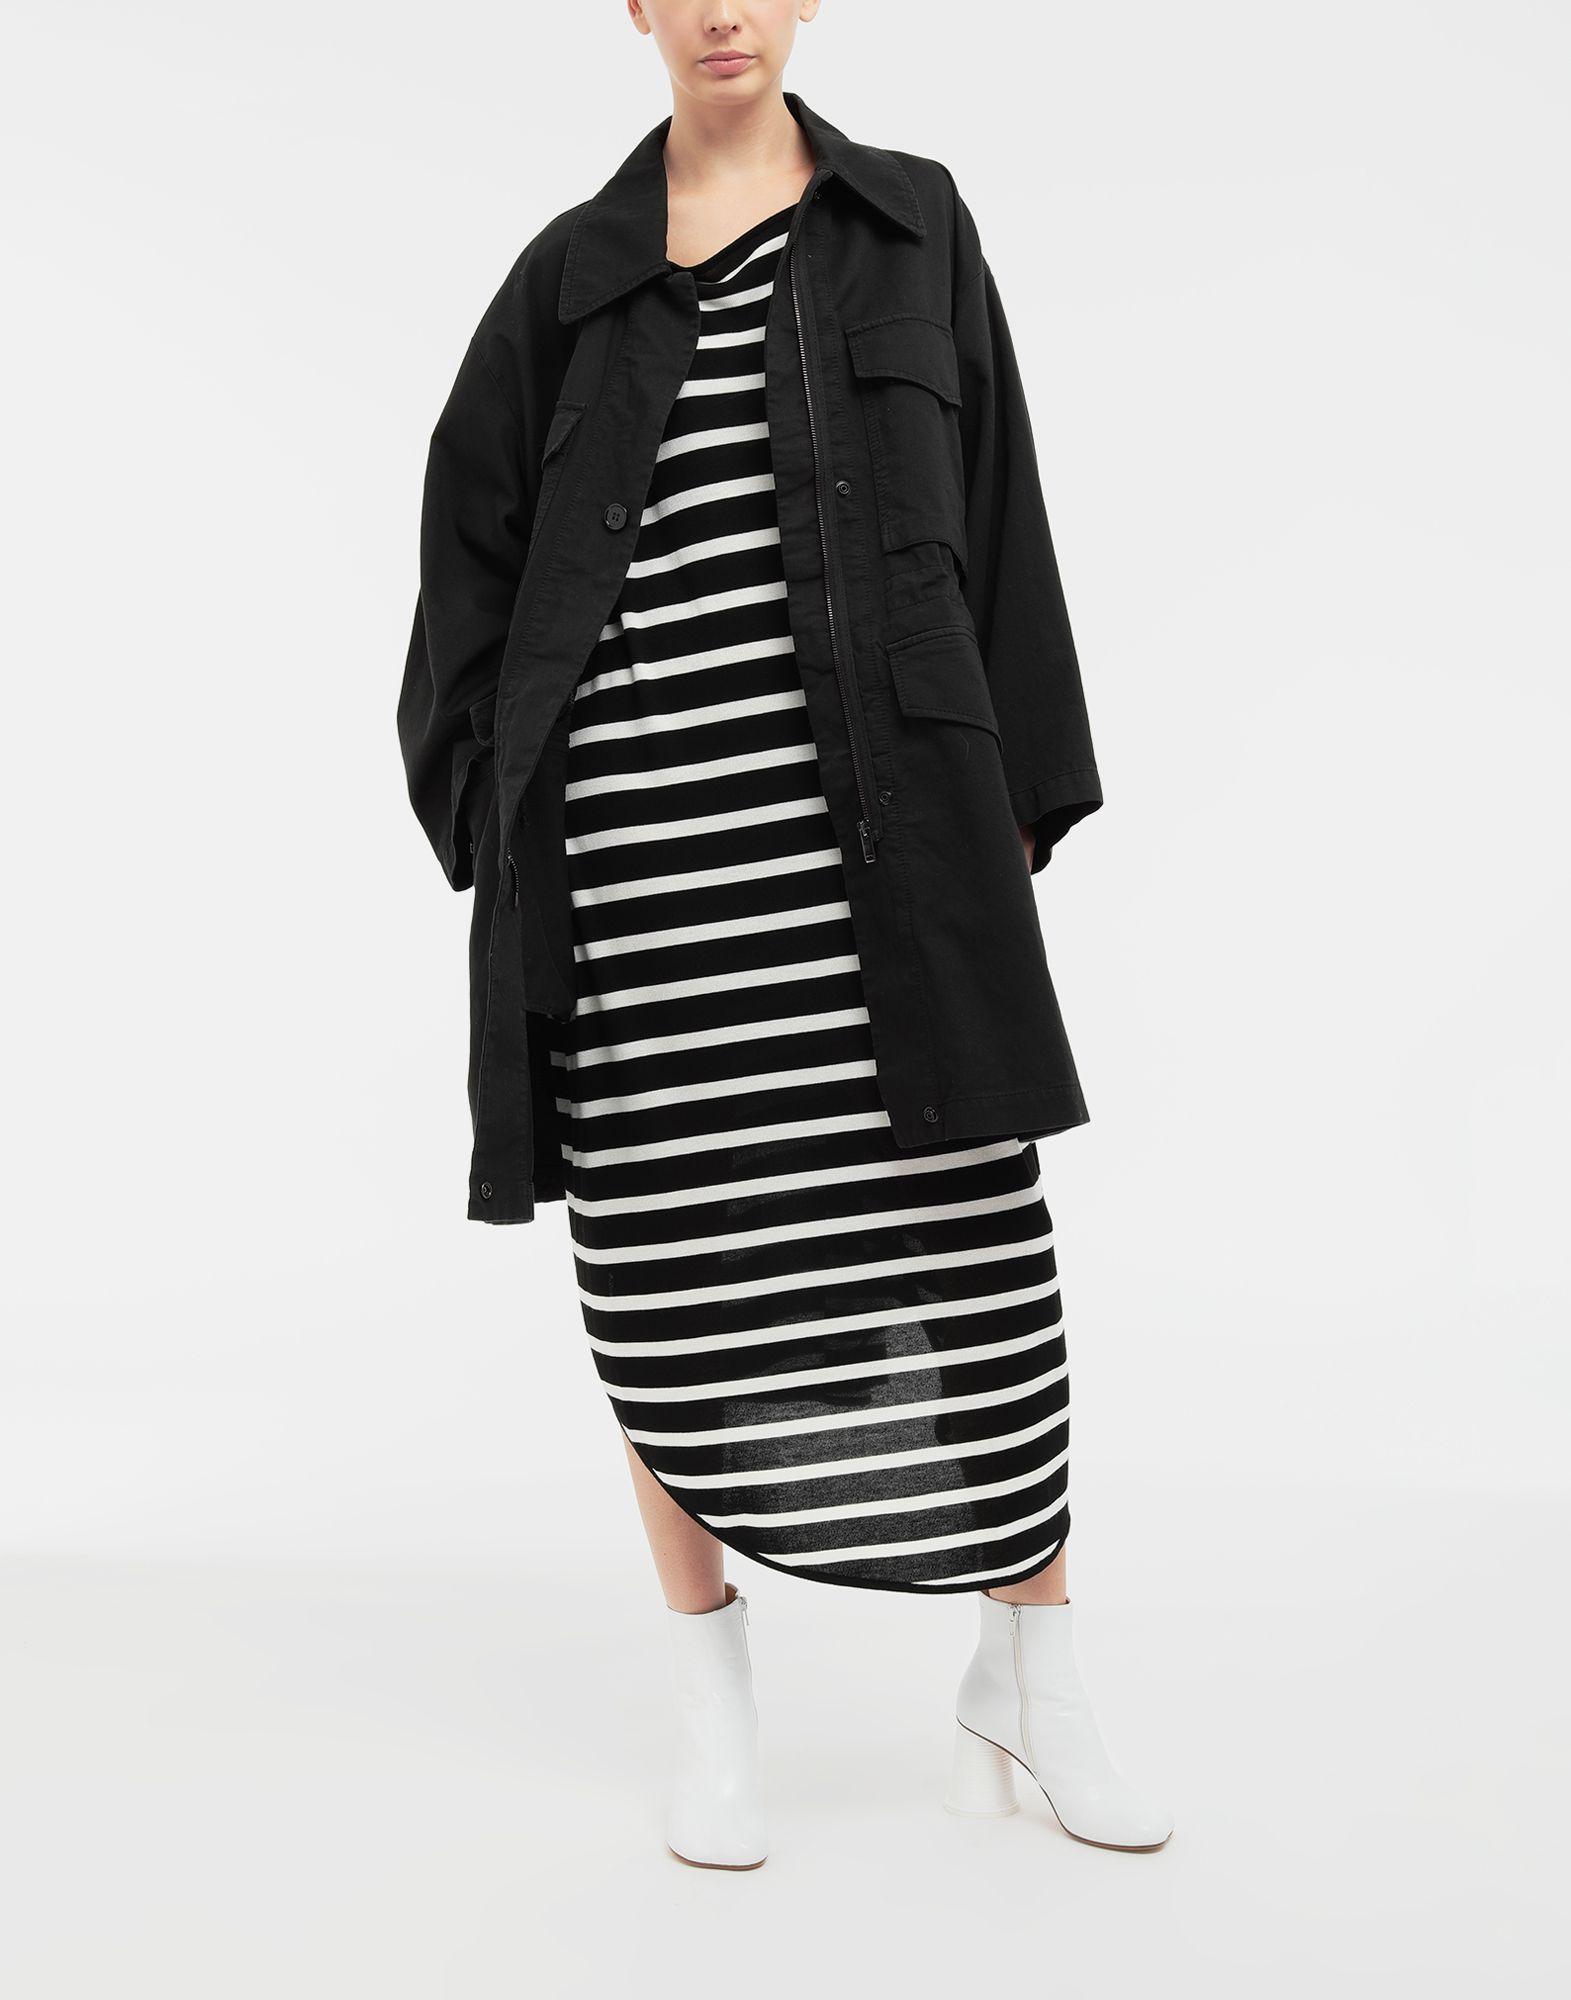 MM6 MAISON MARGIELA Circle striped midi dress Long dress Woman d